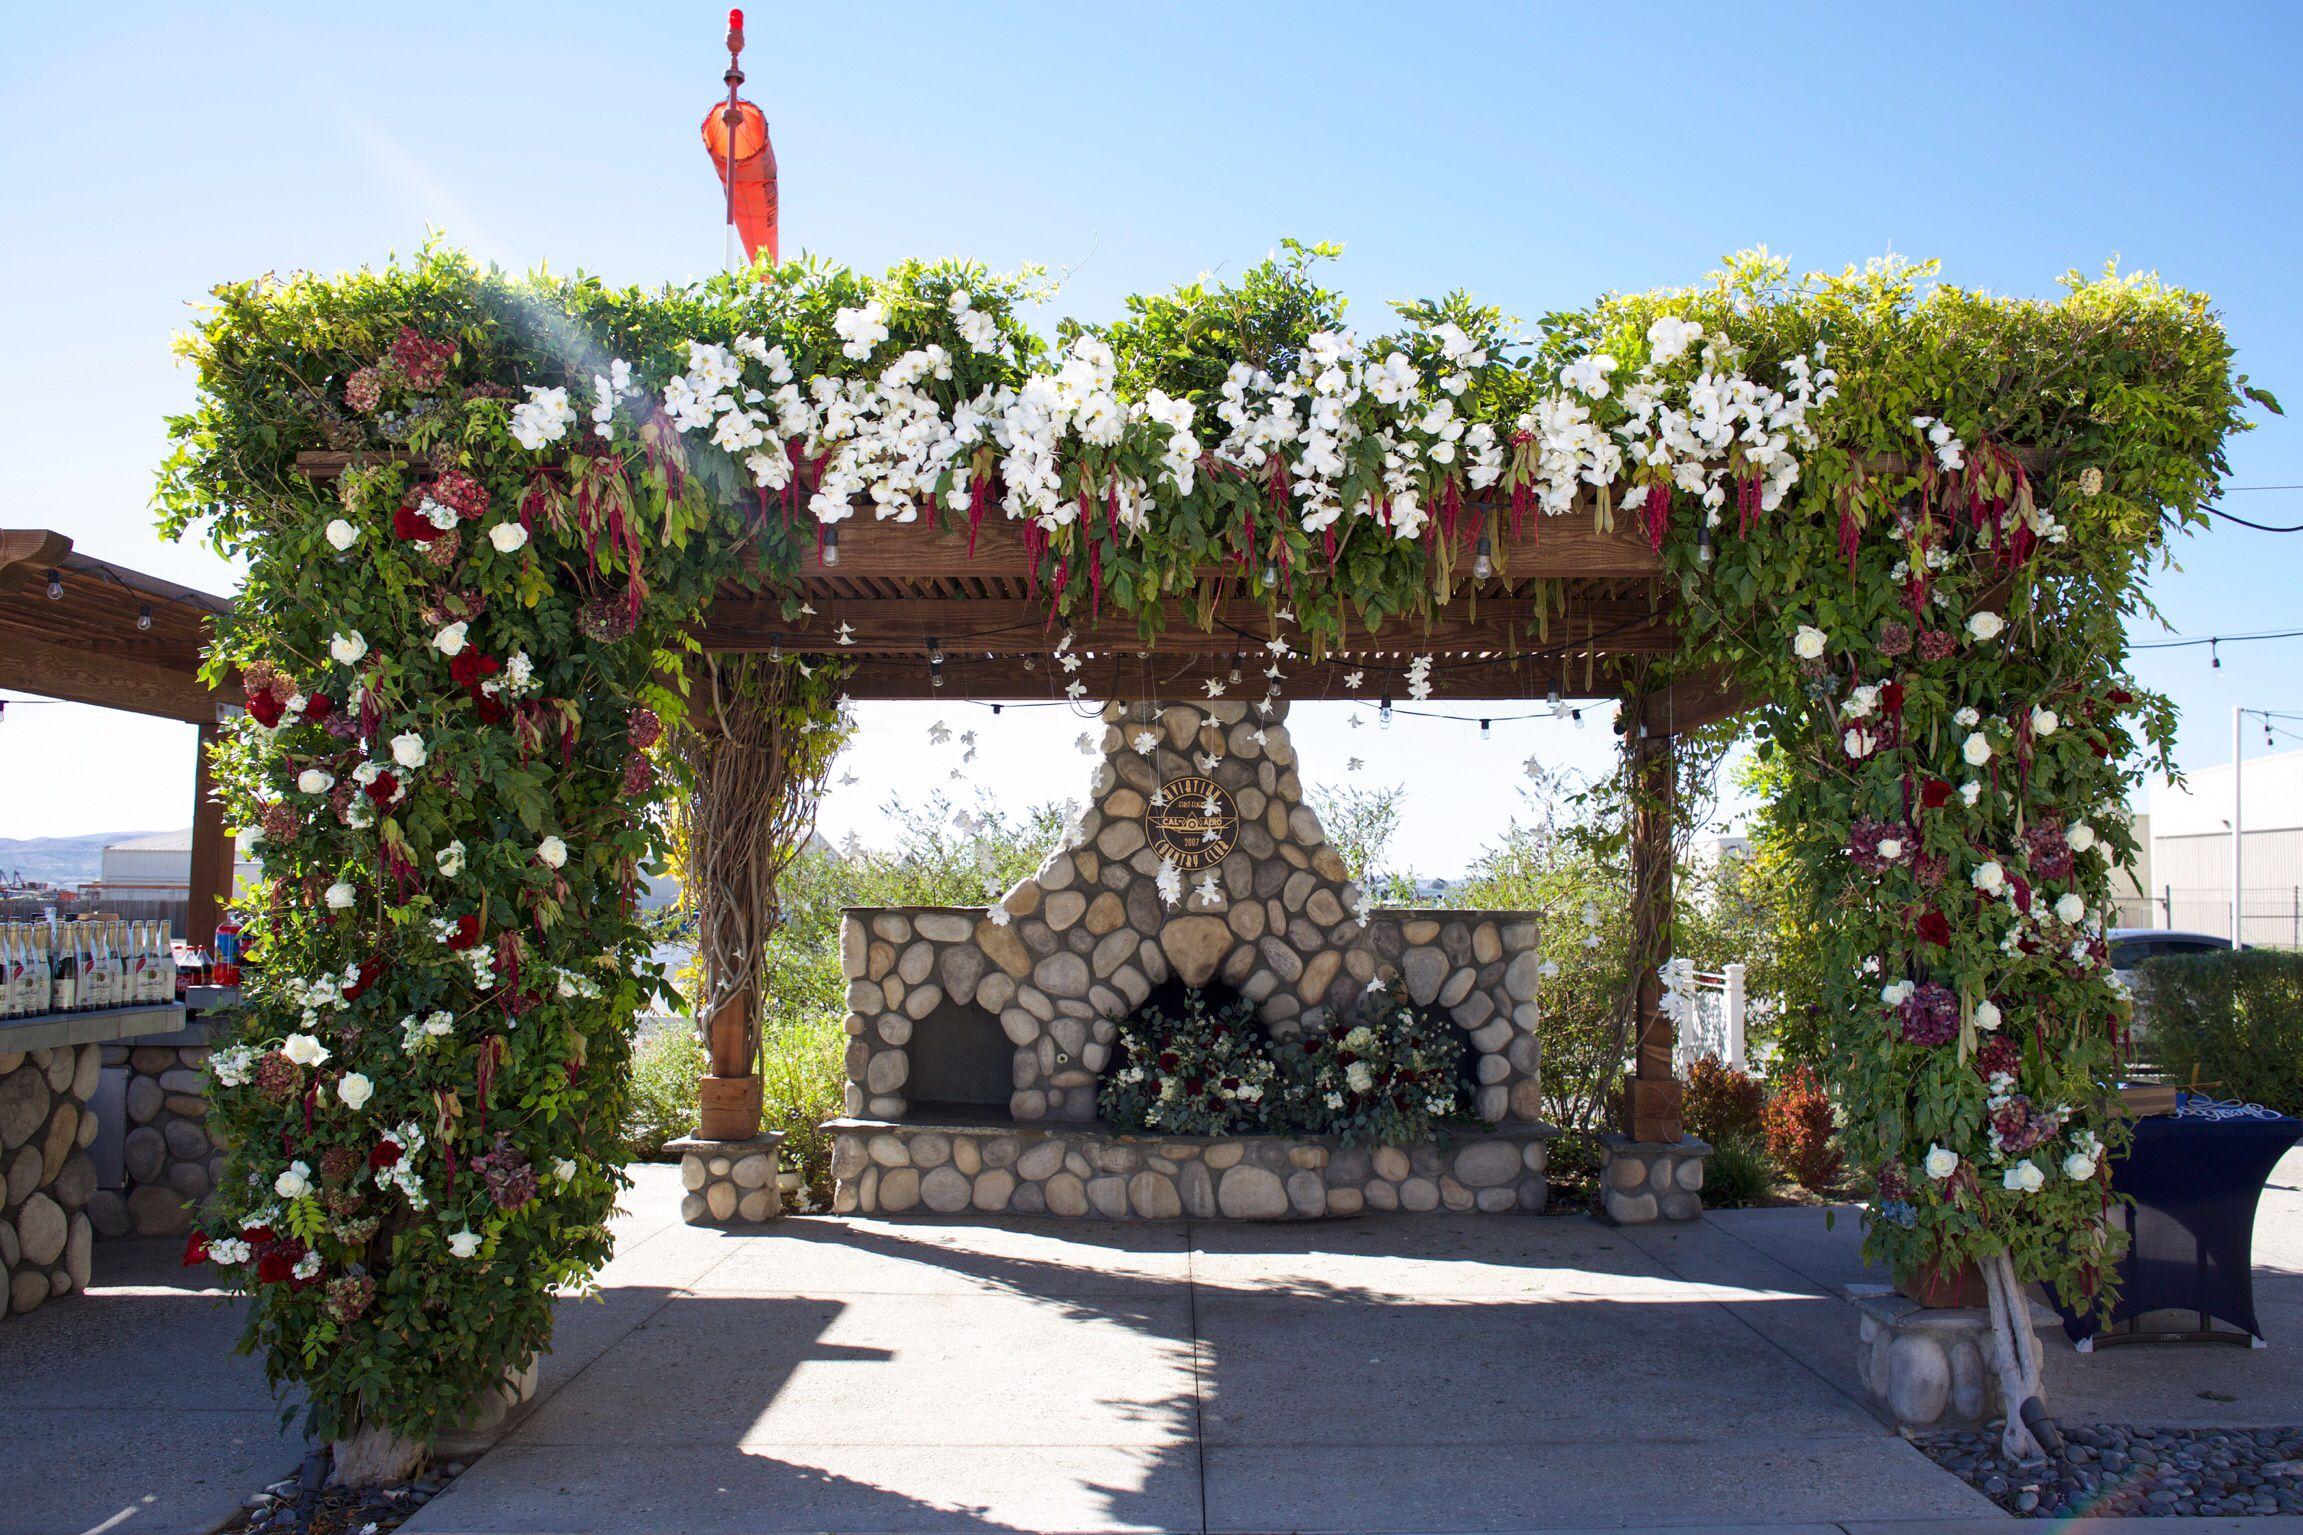 Gazebo arch ceremony flowers image by tommy austin